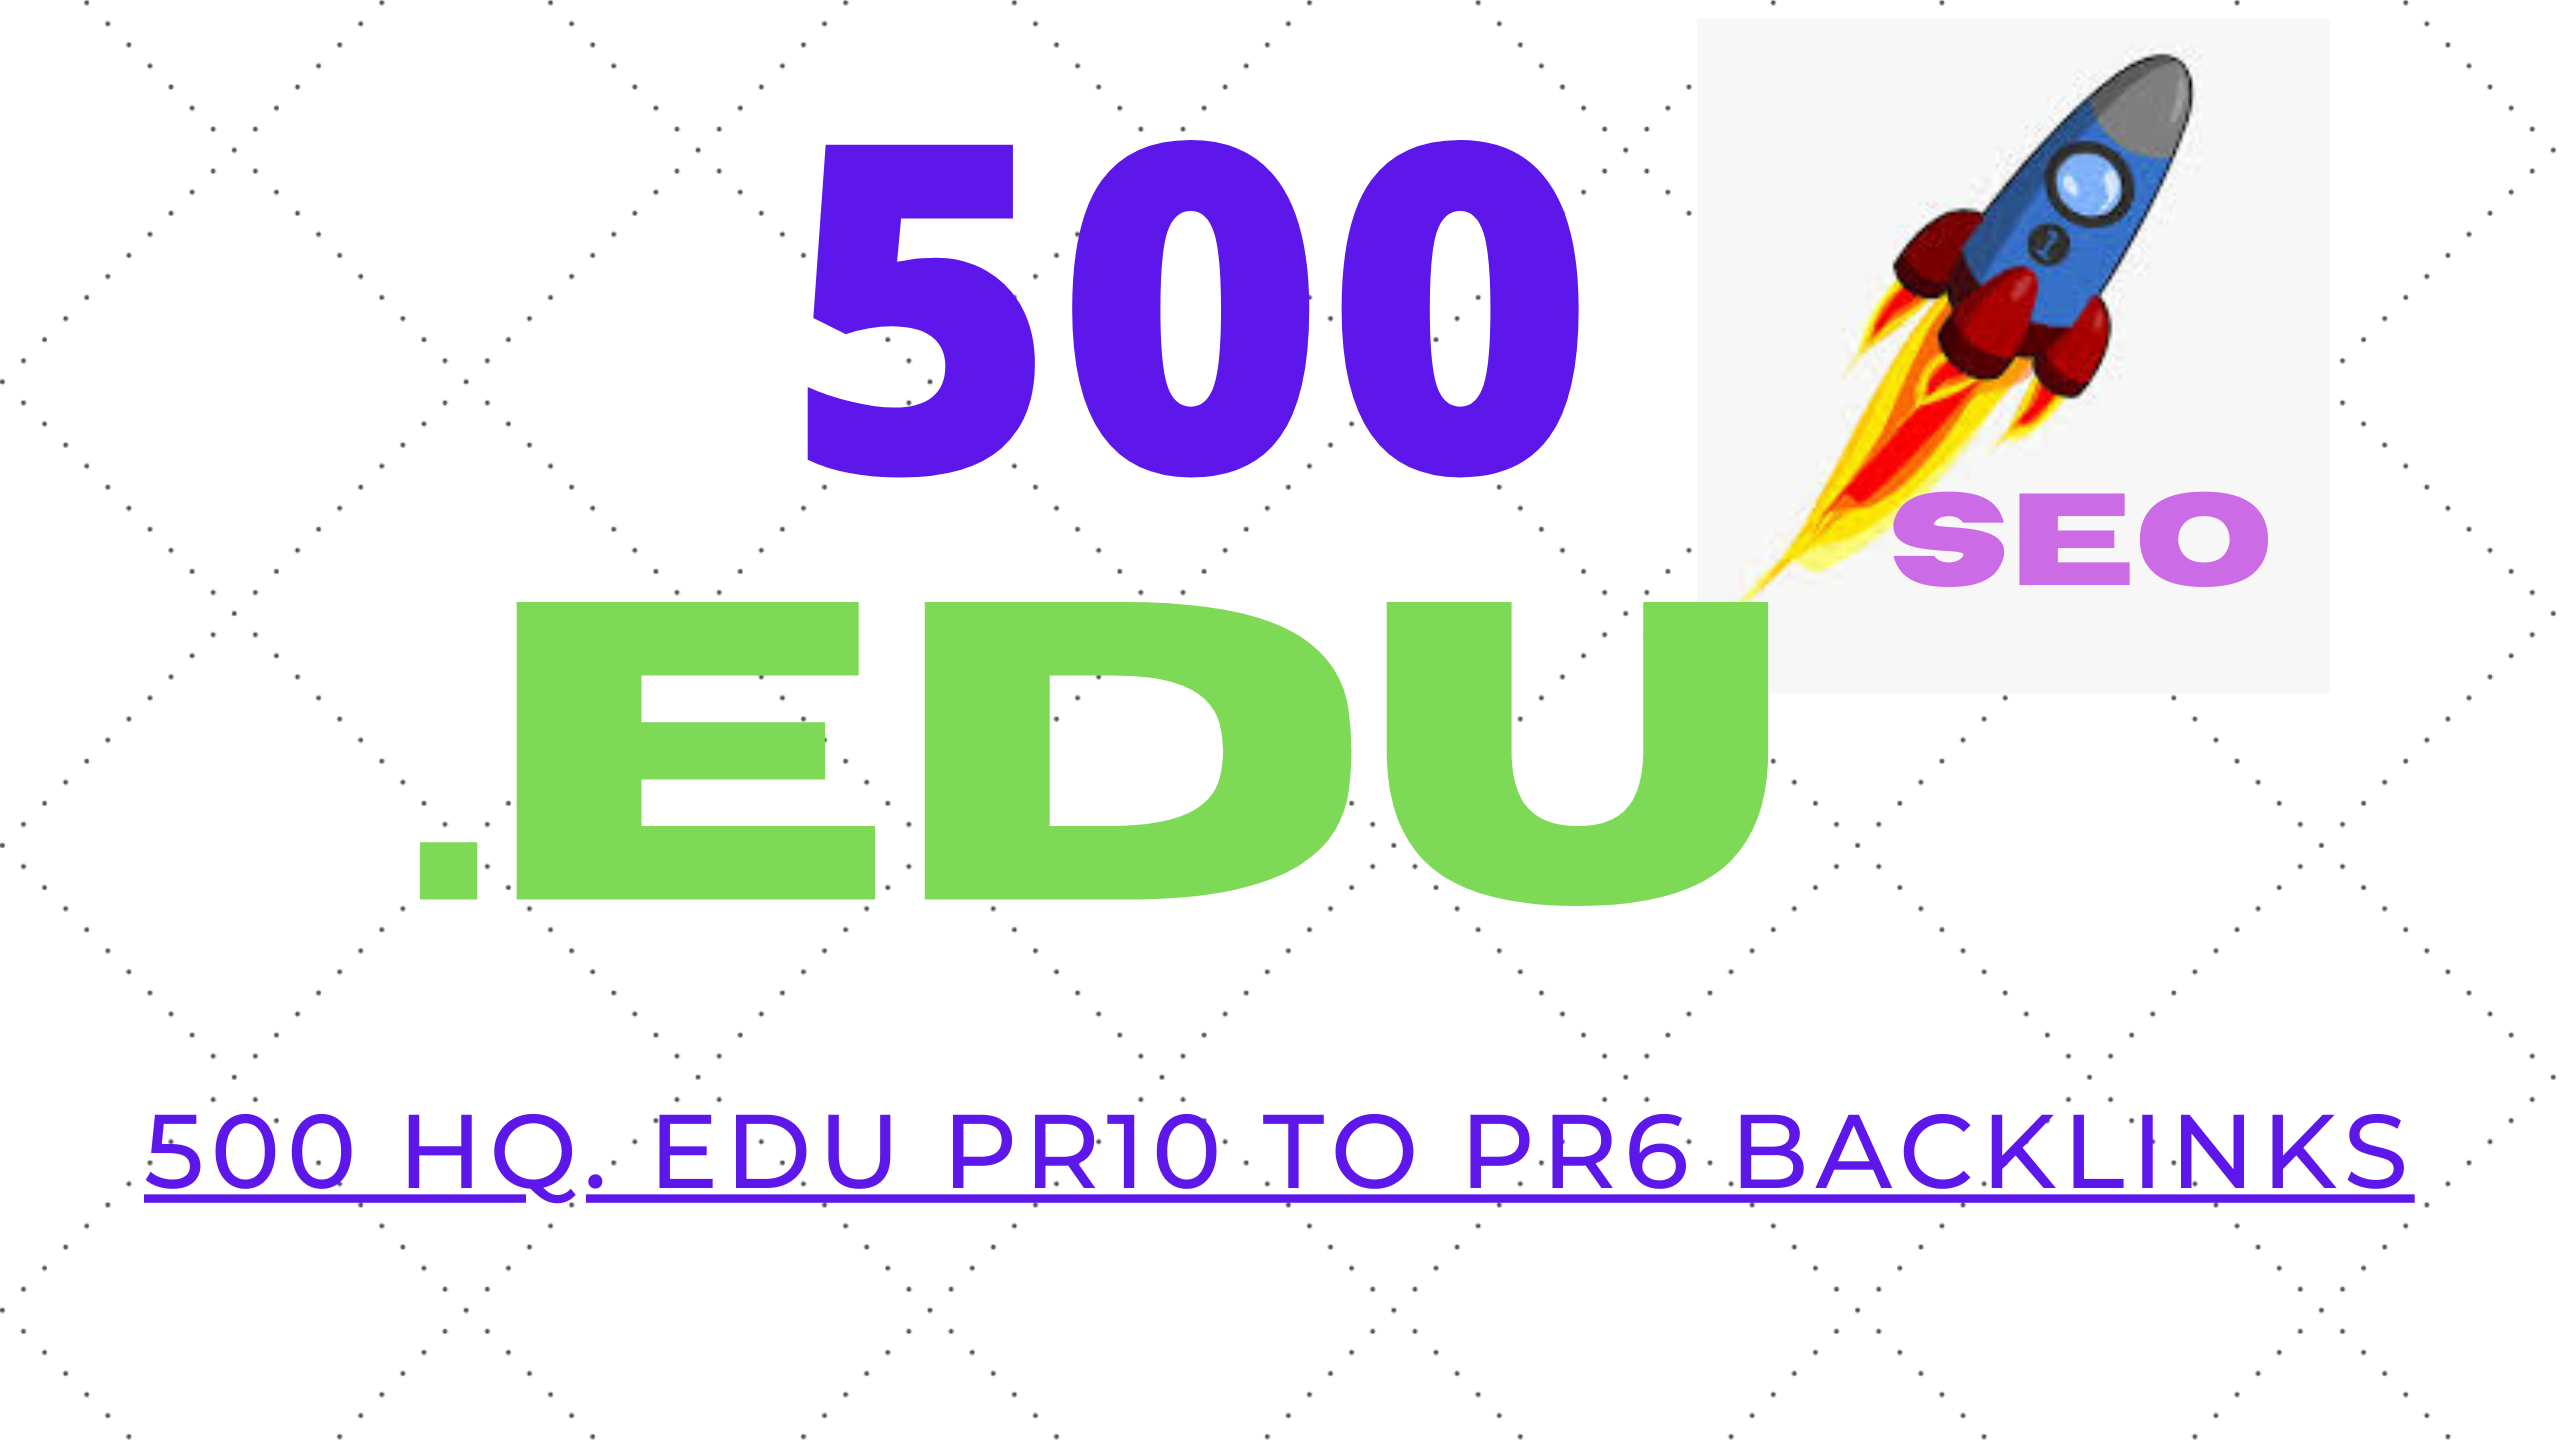 NOW Buy one Get One FREE 500 HQ. EDU PR10 to PR6 Backlinks Fantastic package